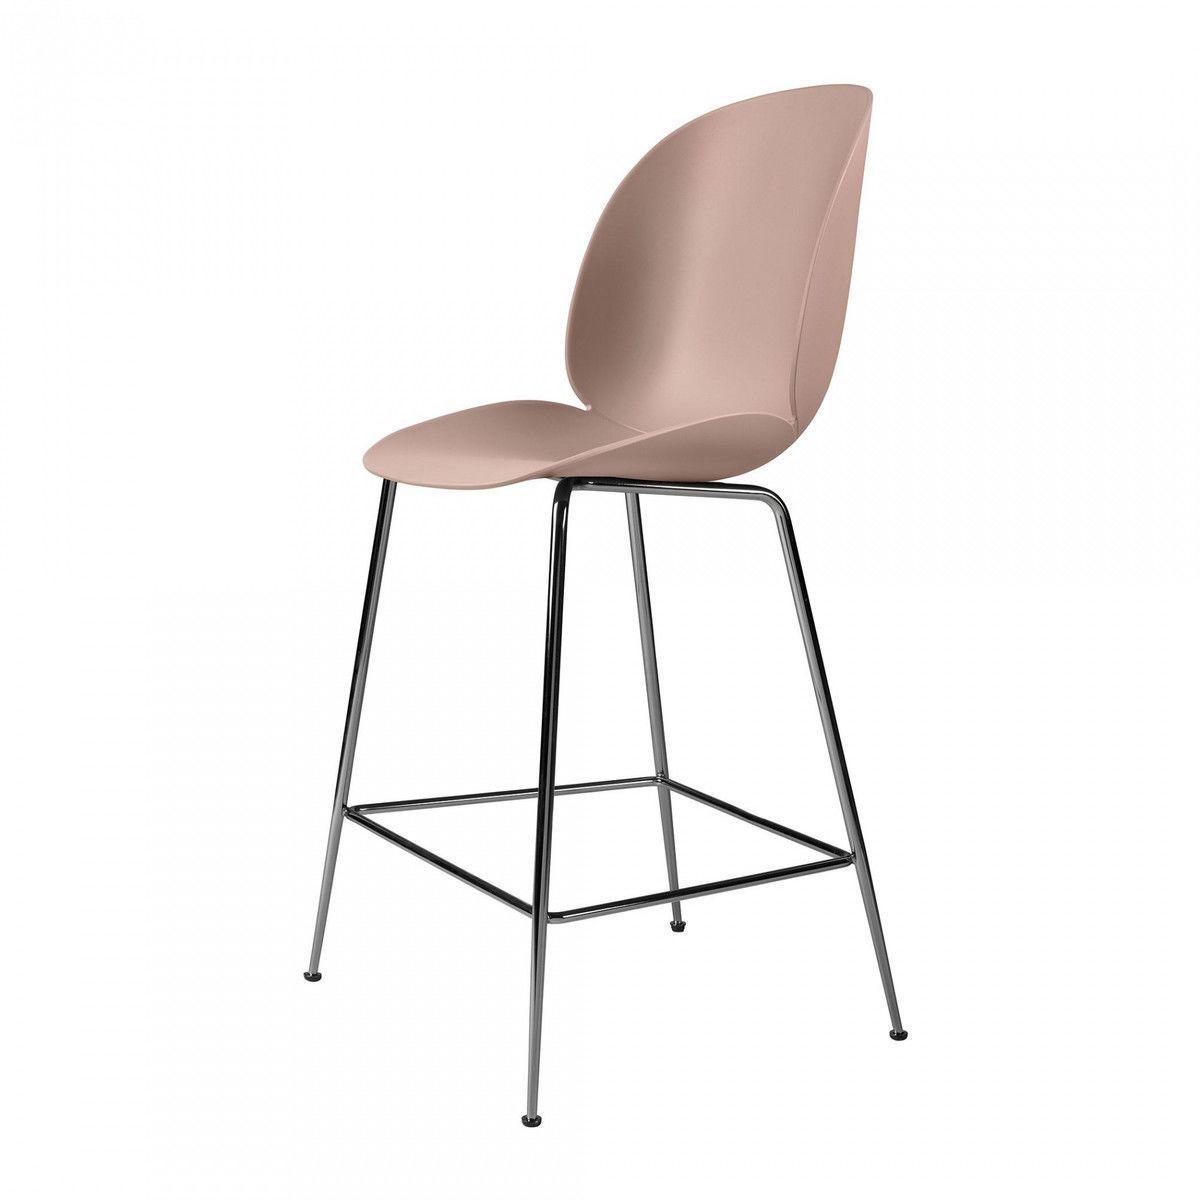 Beetle counter chair barhocker chrom 108cm gubi for Barhocker pink